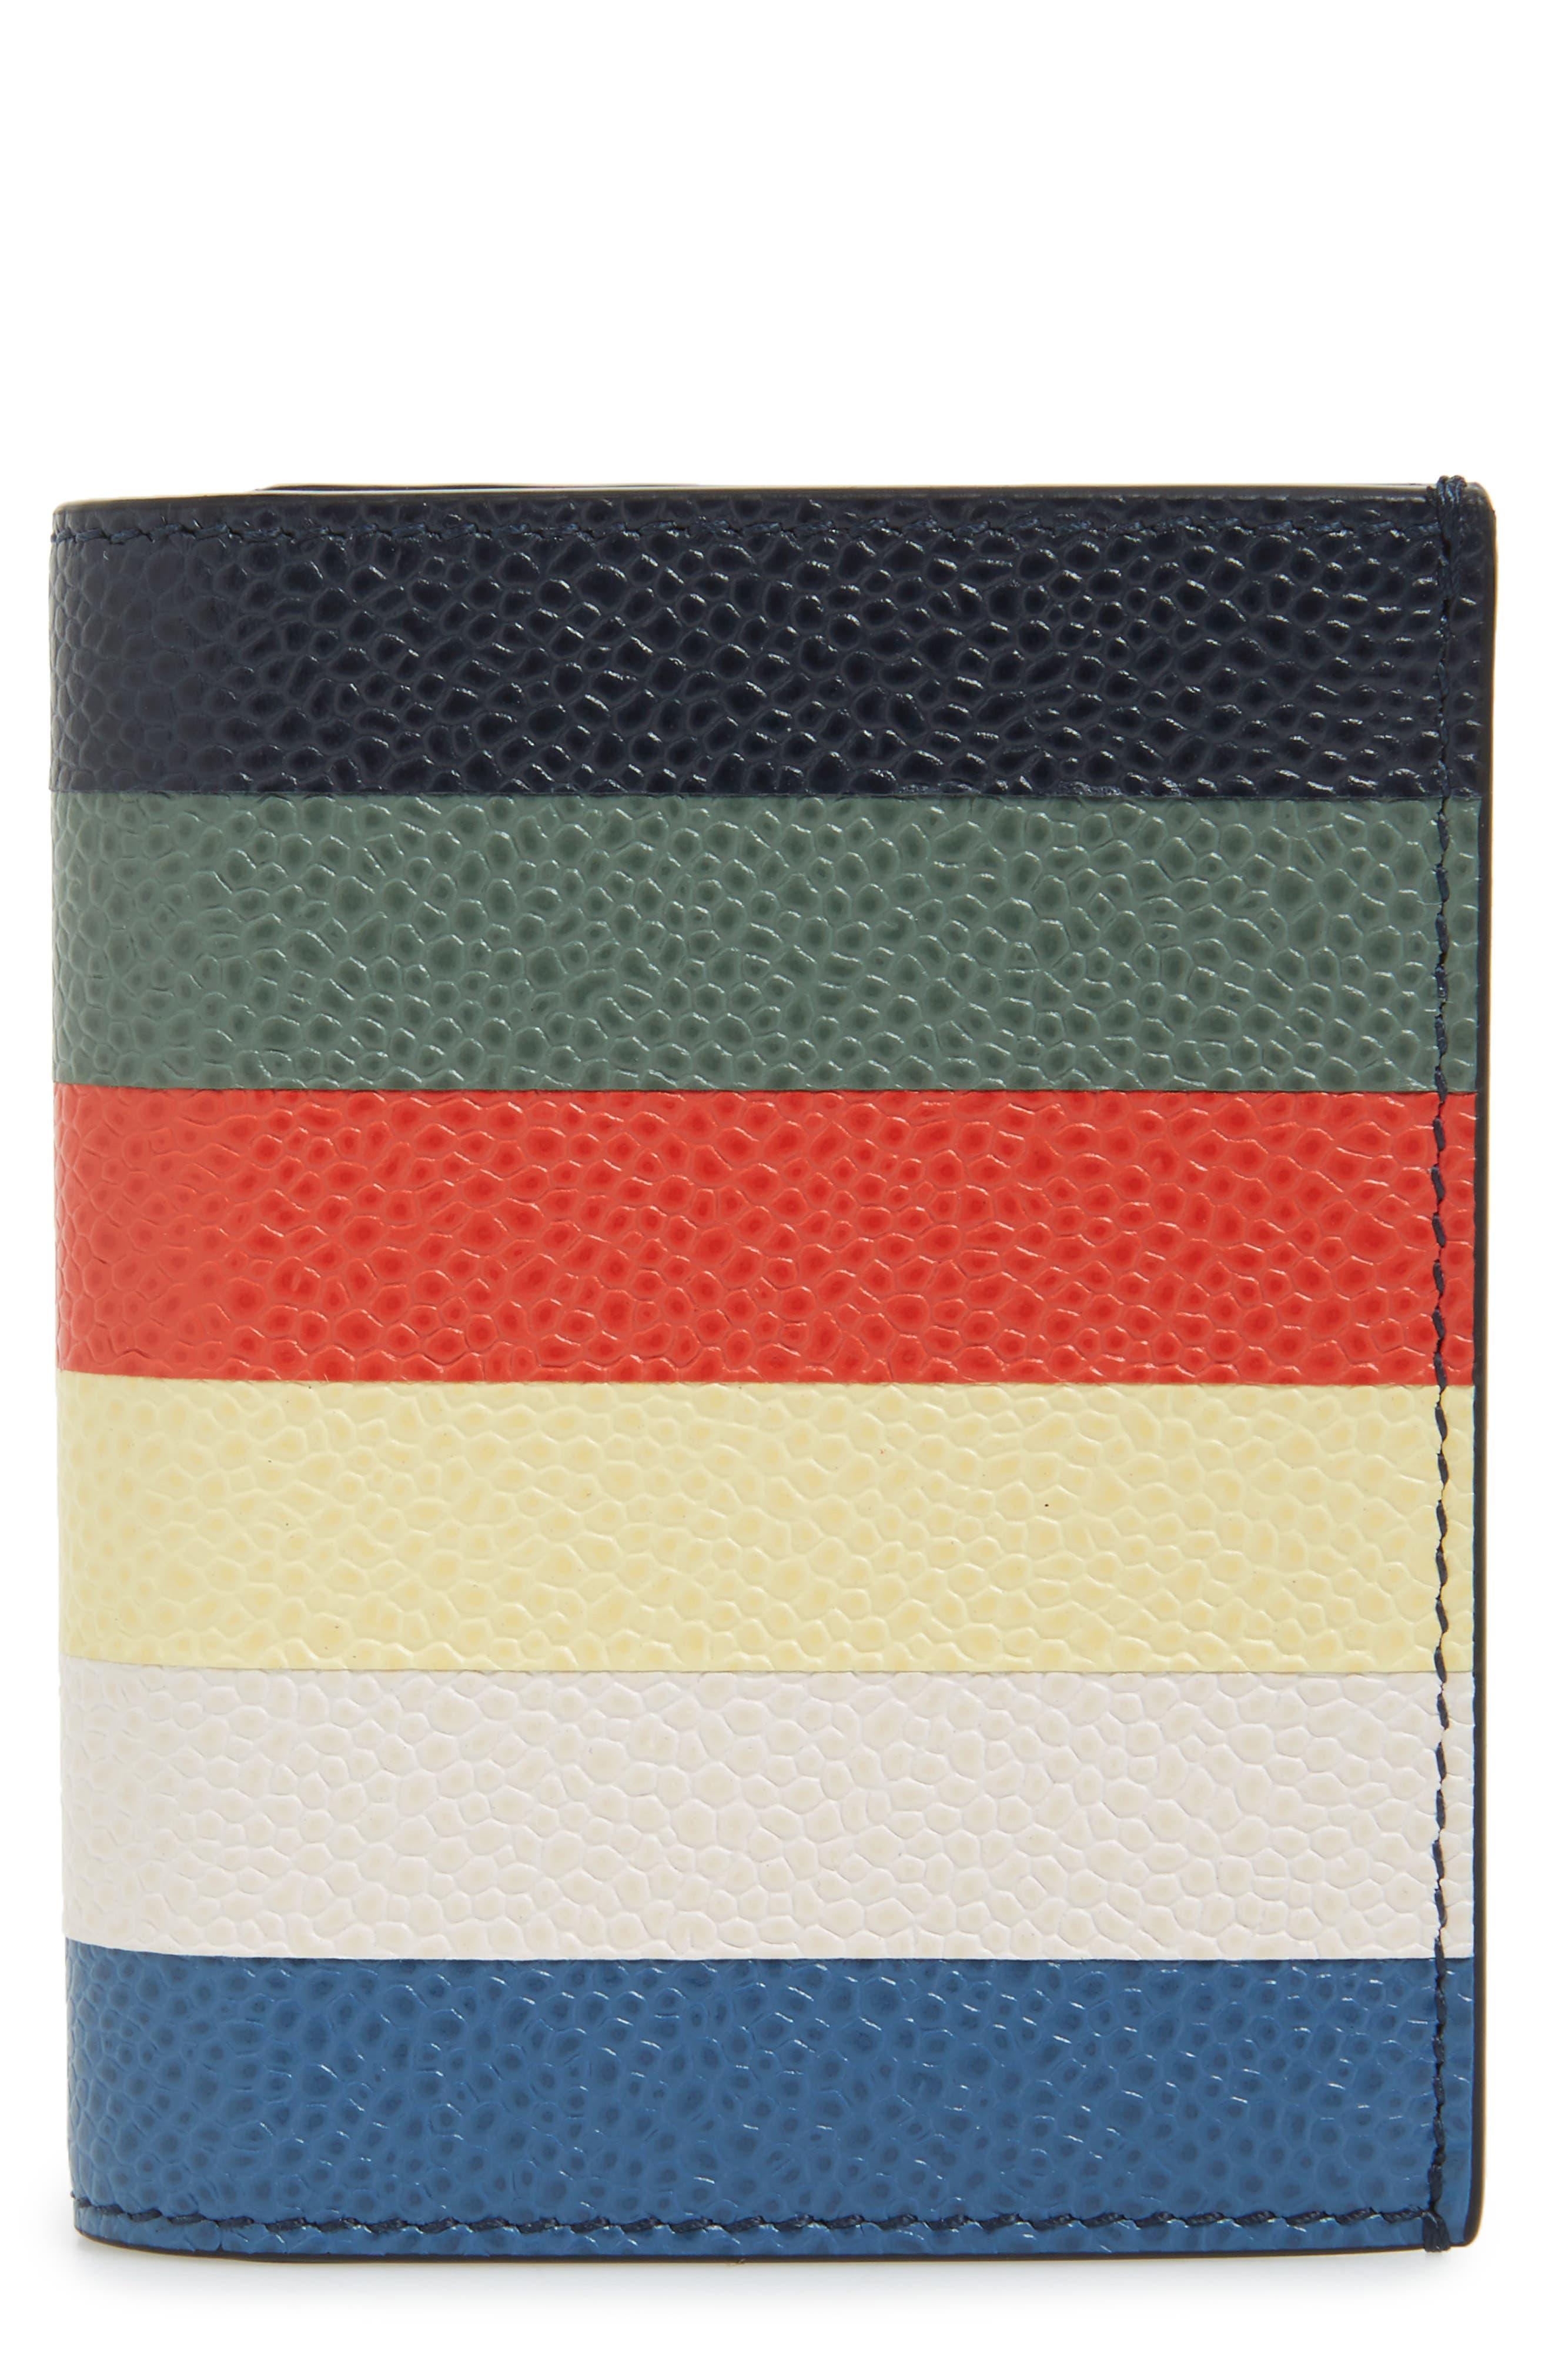 THOM BROWNE Leather Pocket Organizer